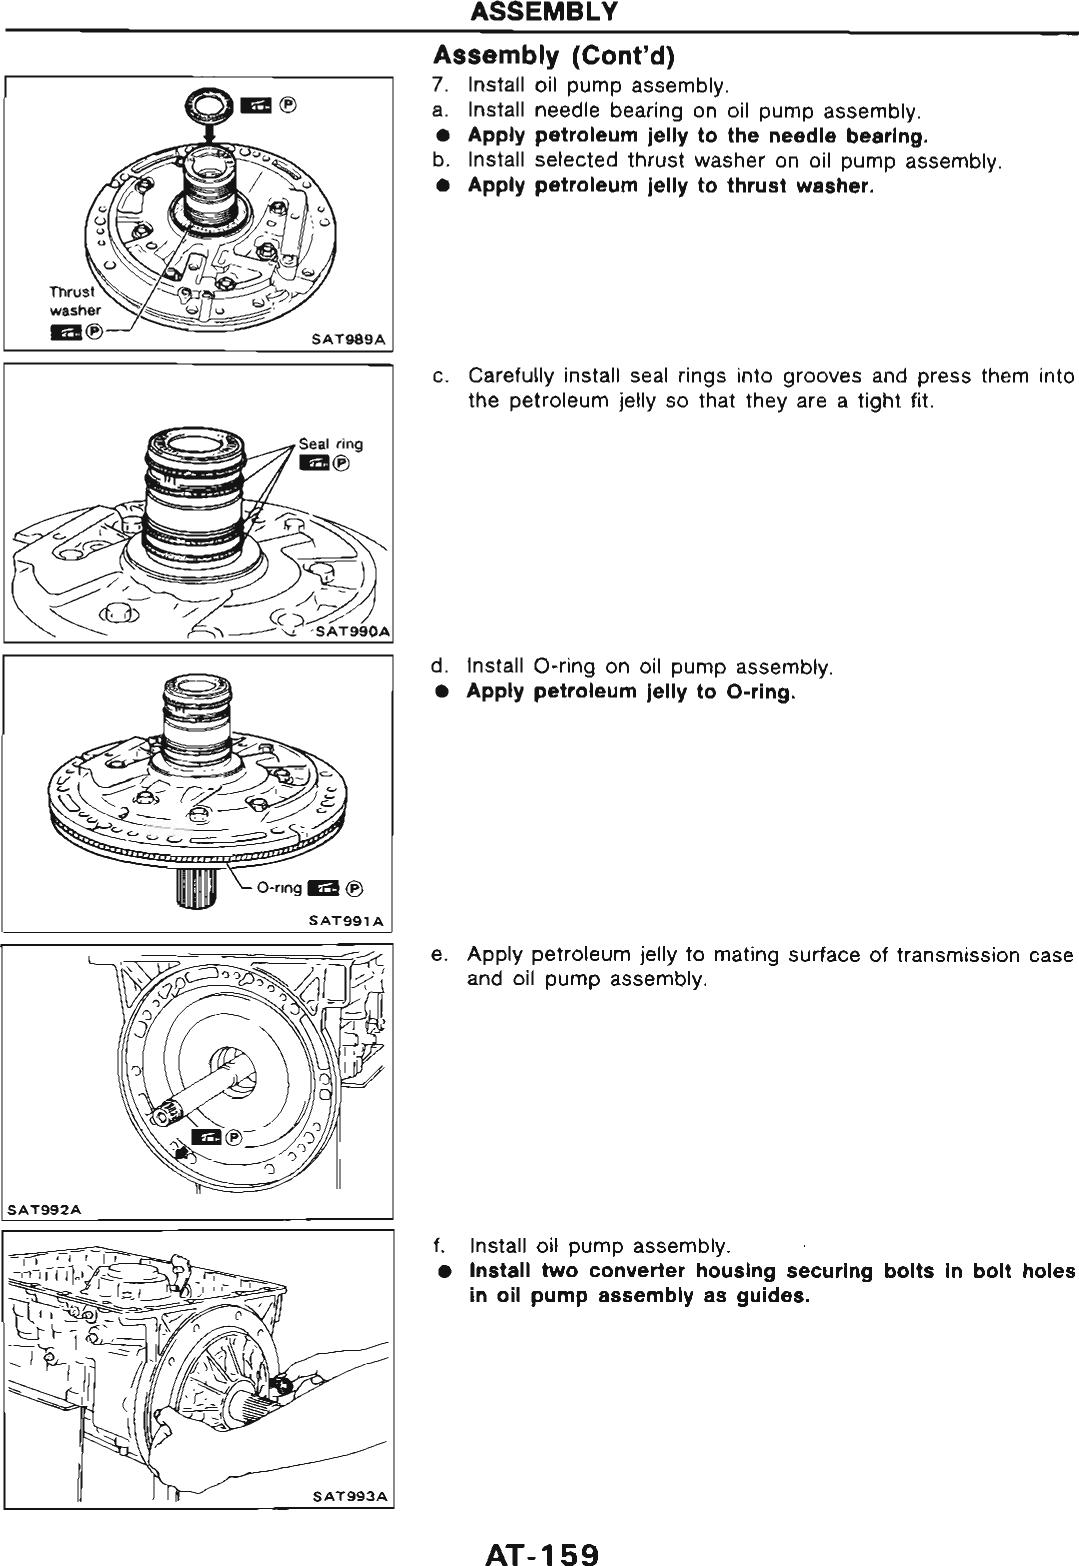 Nissan 1989 240Sx Repair Manual Service